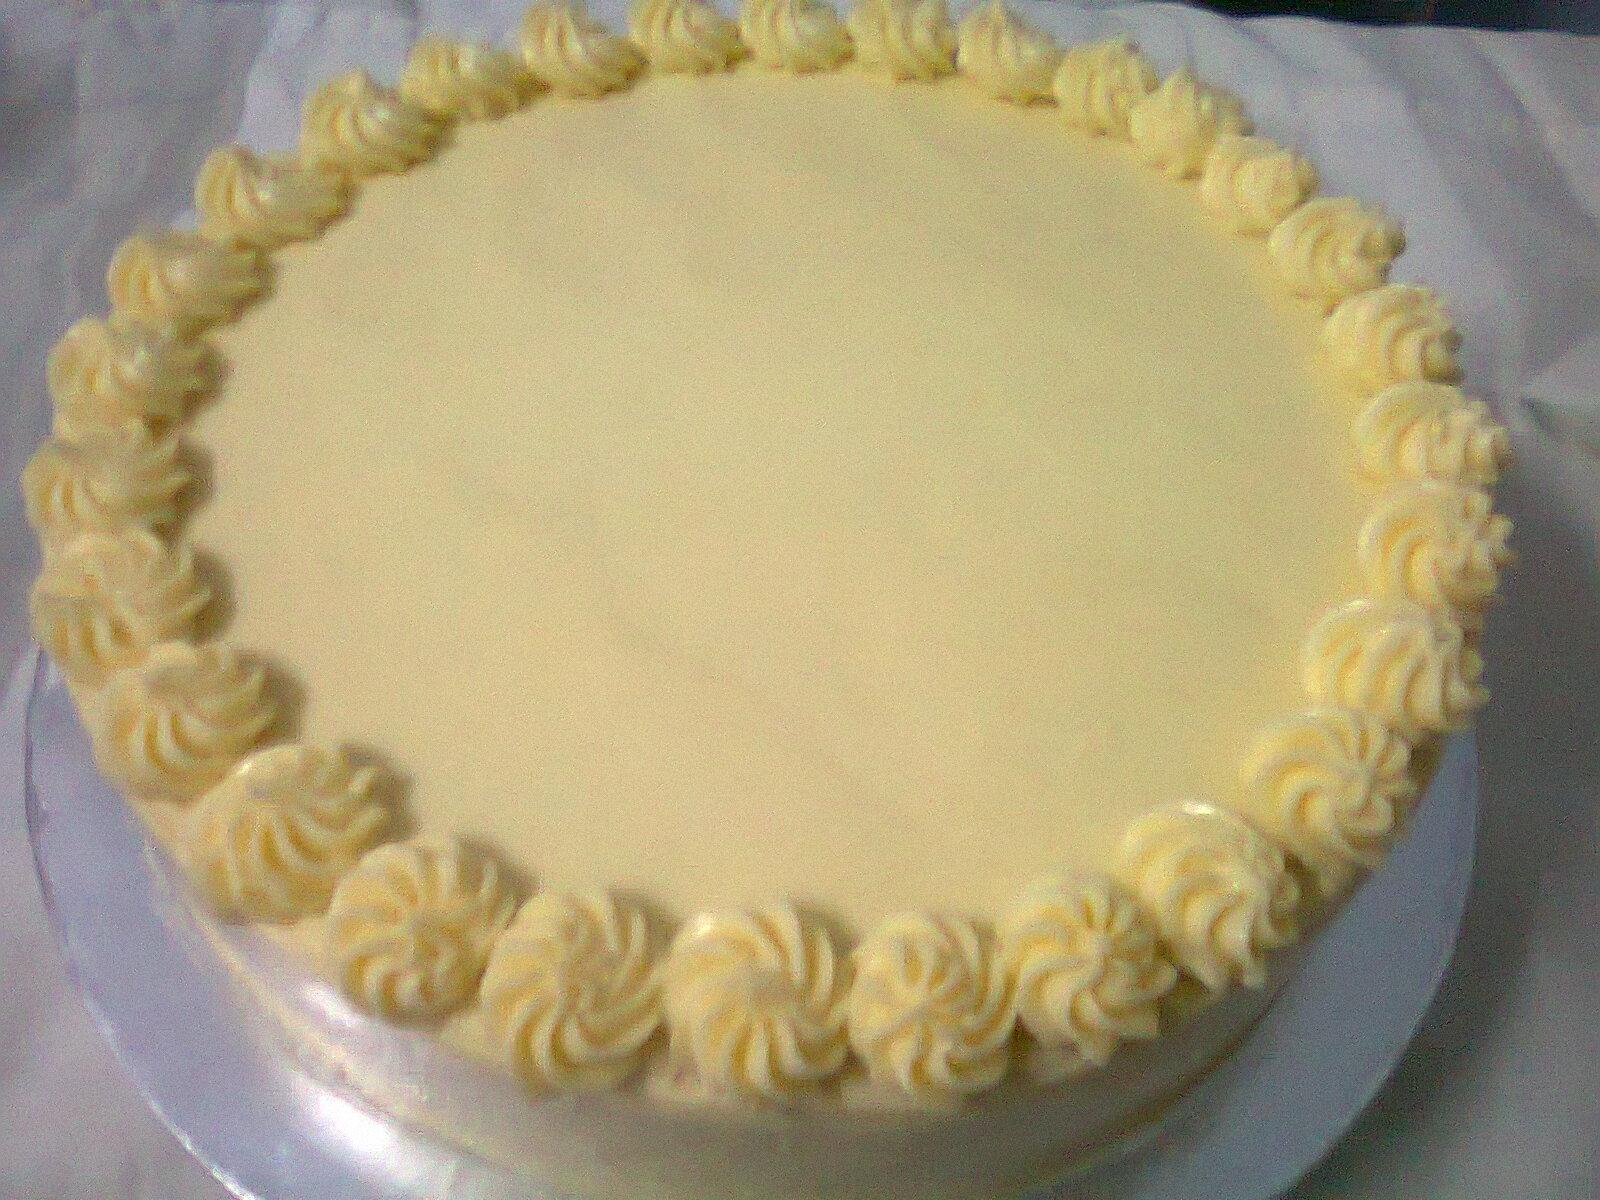 Icing Kek Oren